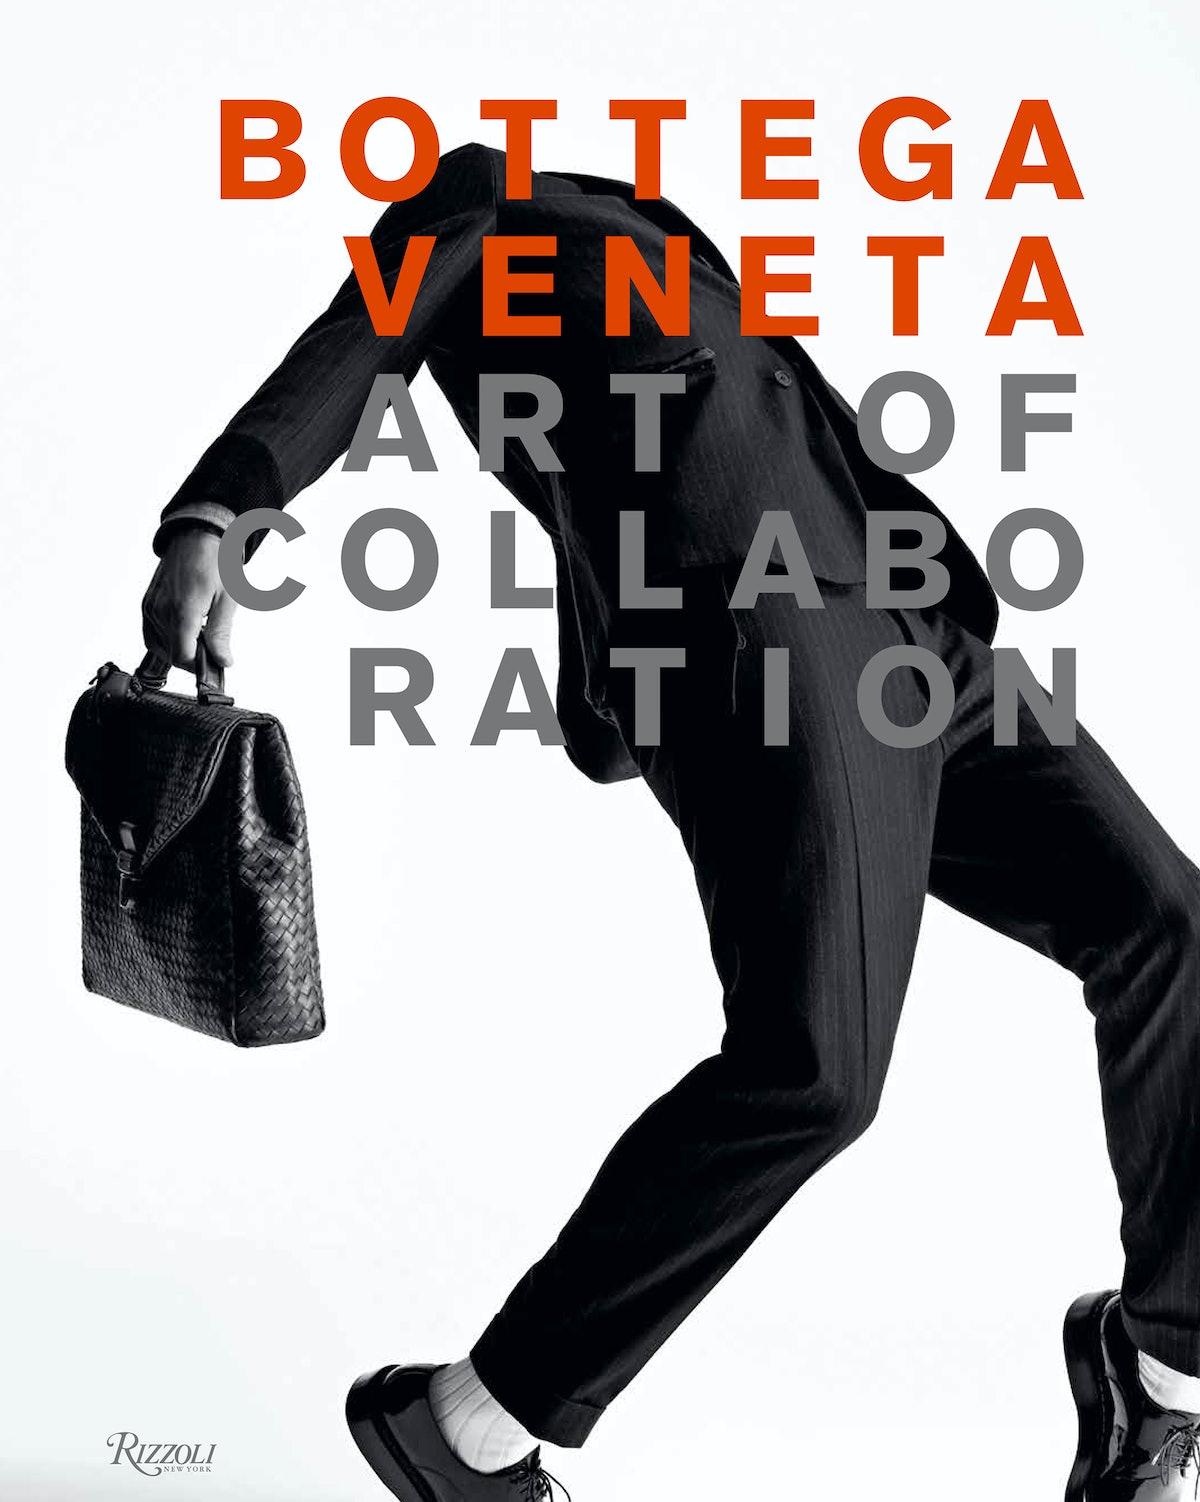 Bottega Bookbottega-book-1